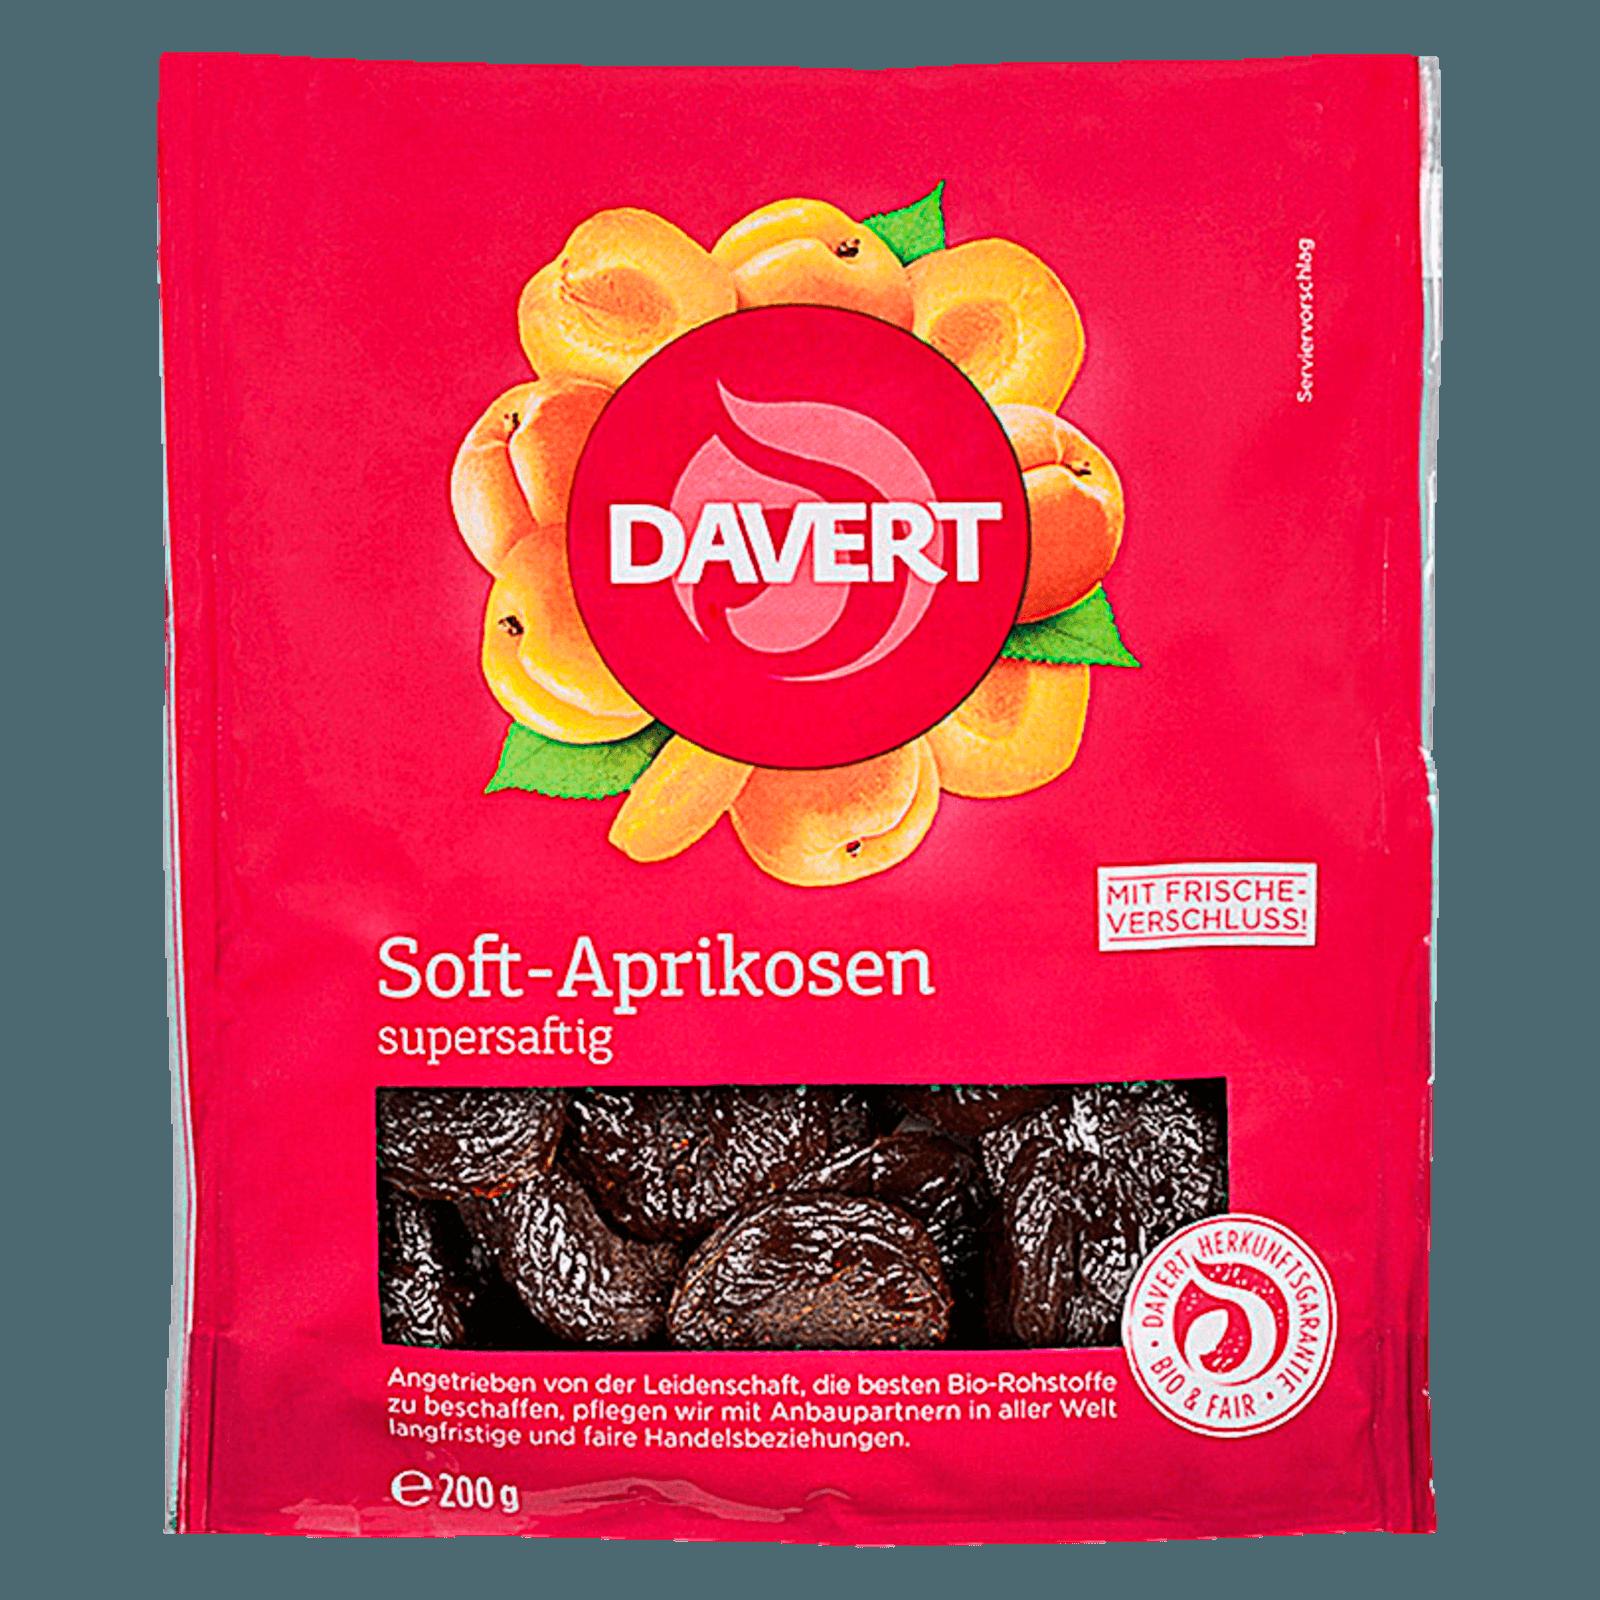 Davert Soft Aprikosen 200g